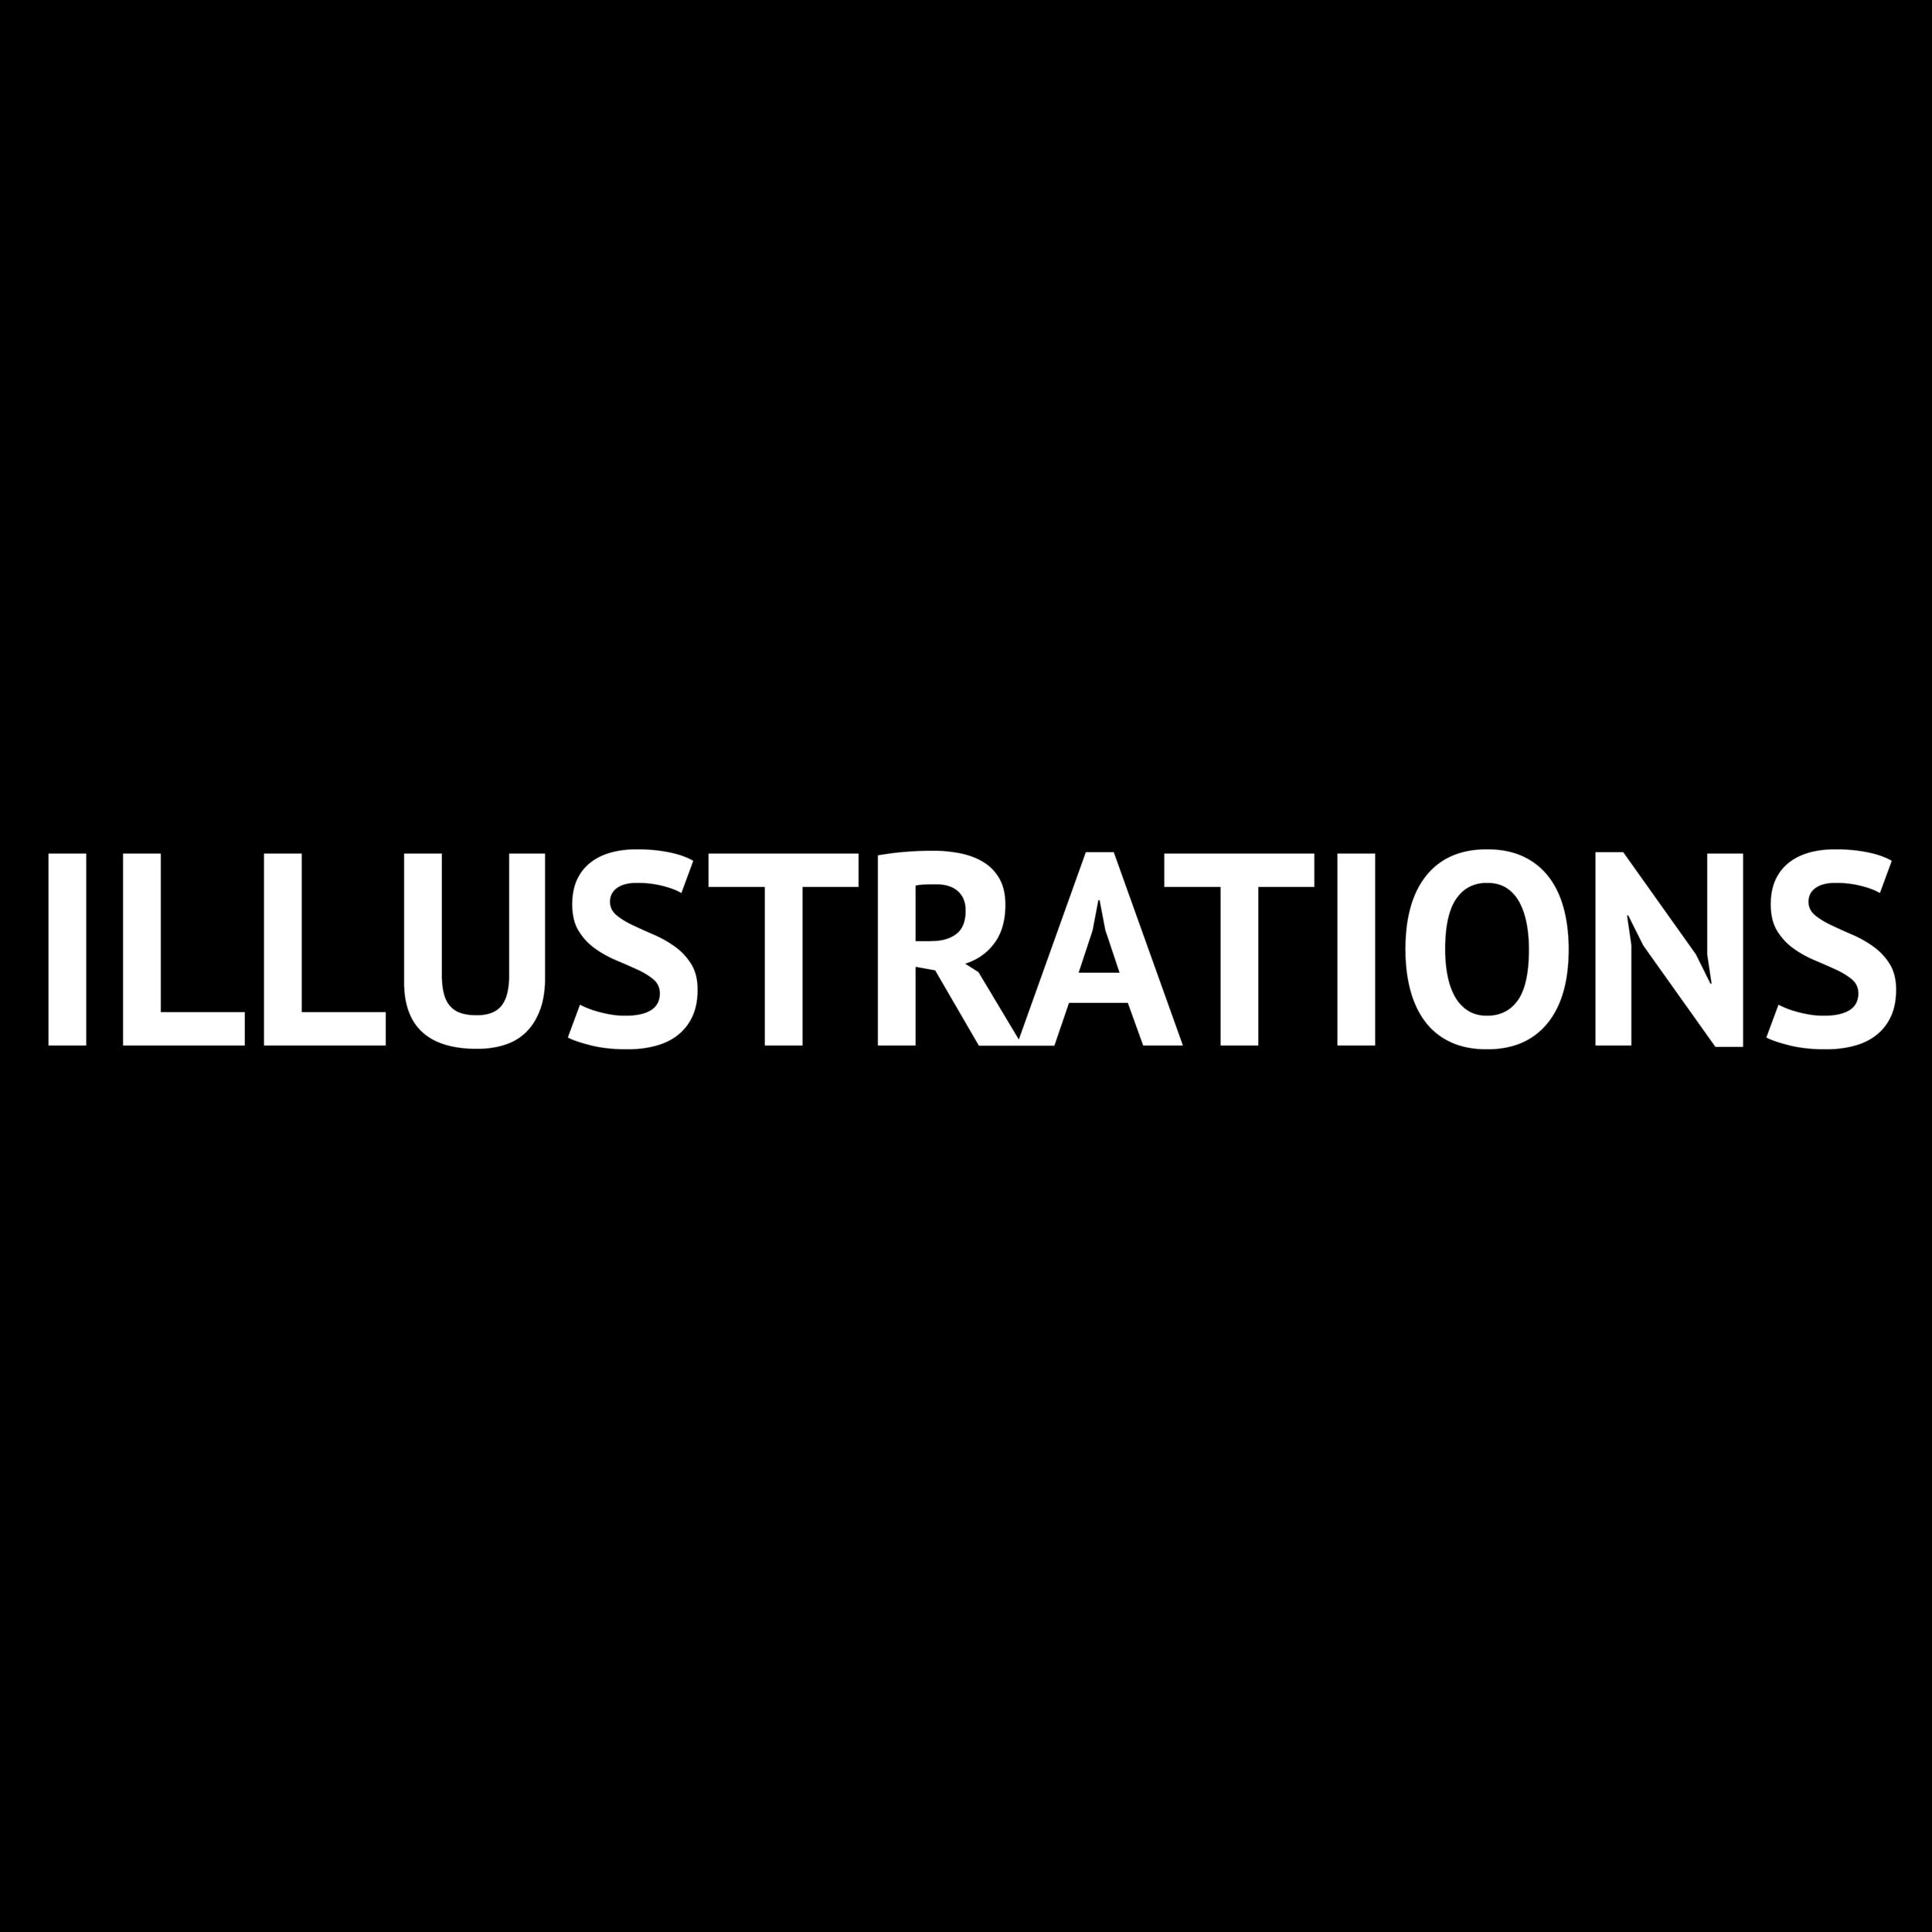 ILLUSTRATIONS  | Bre.